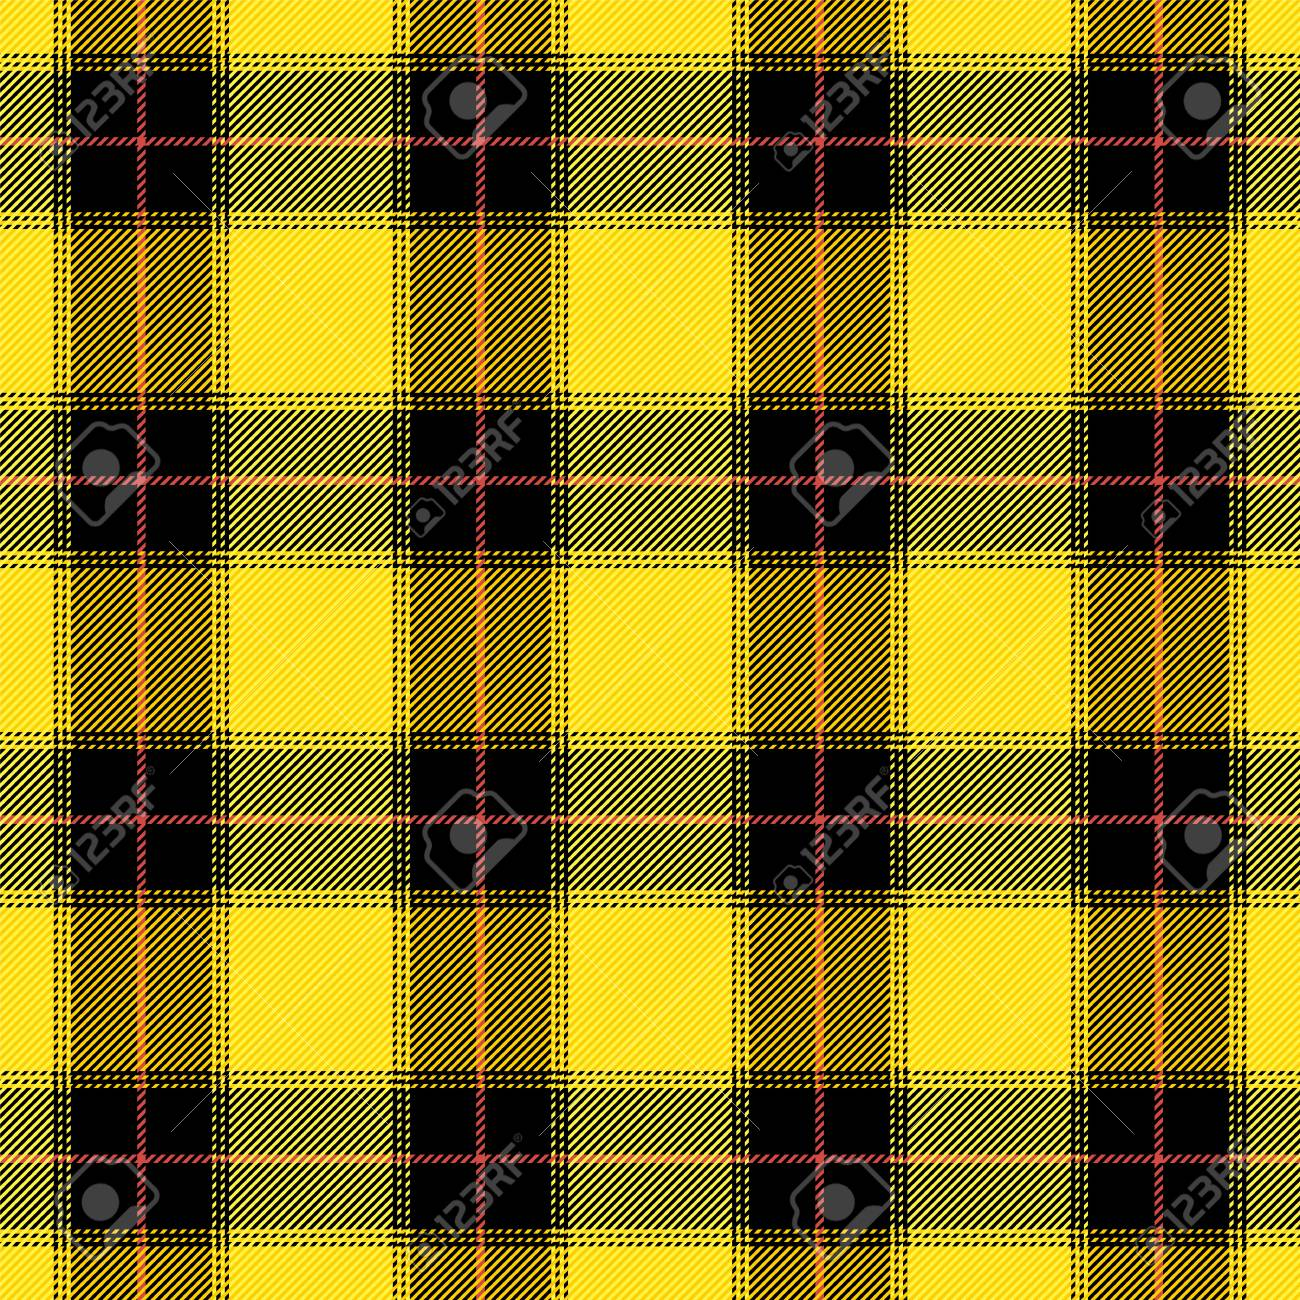 Maclachlan tartan plaid  Scottish pattern in yellow and black